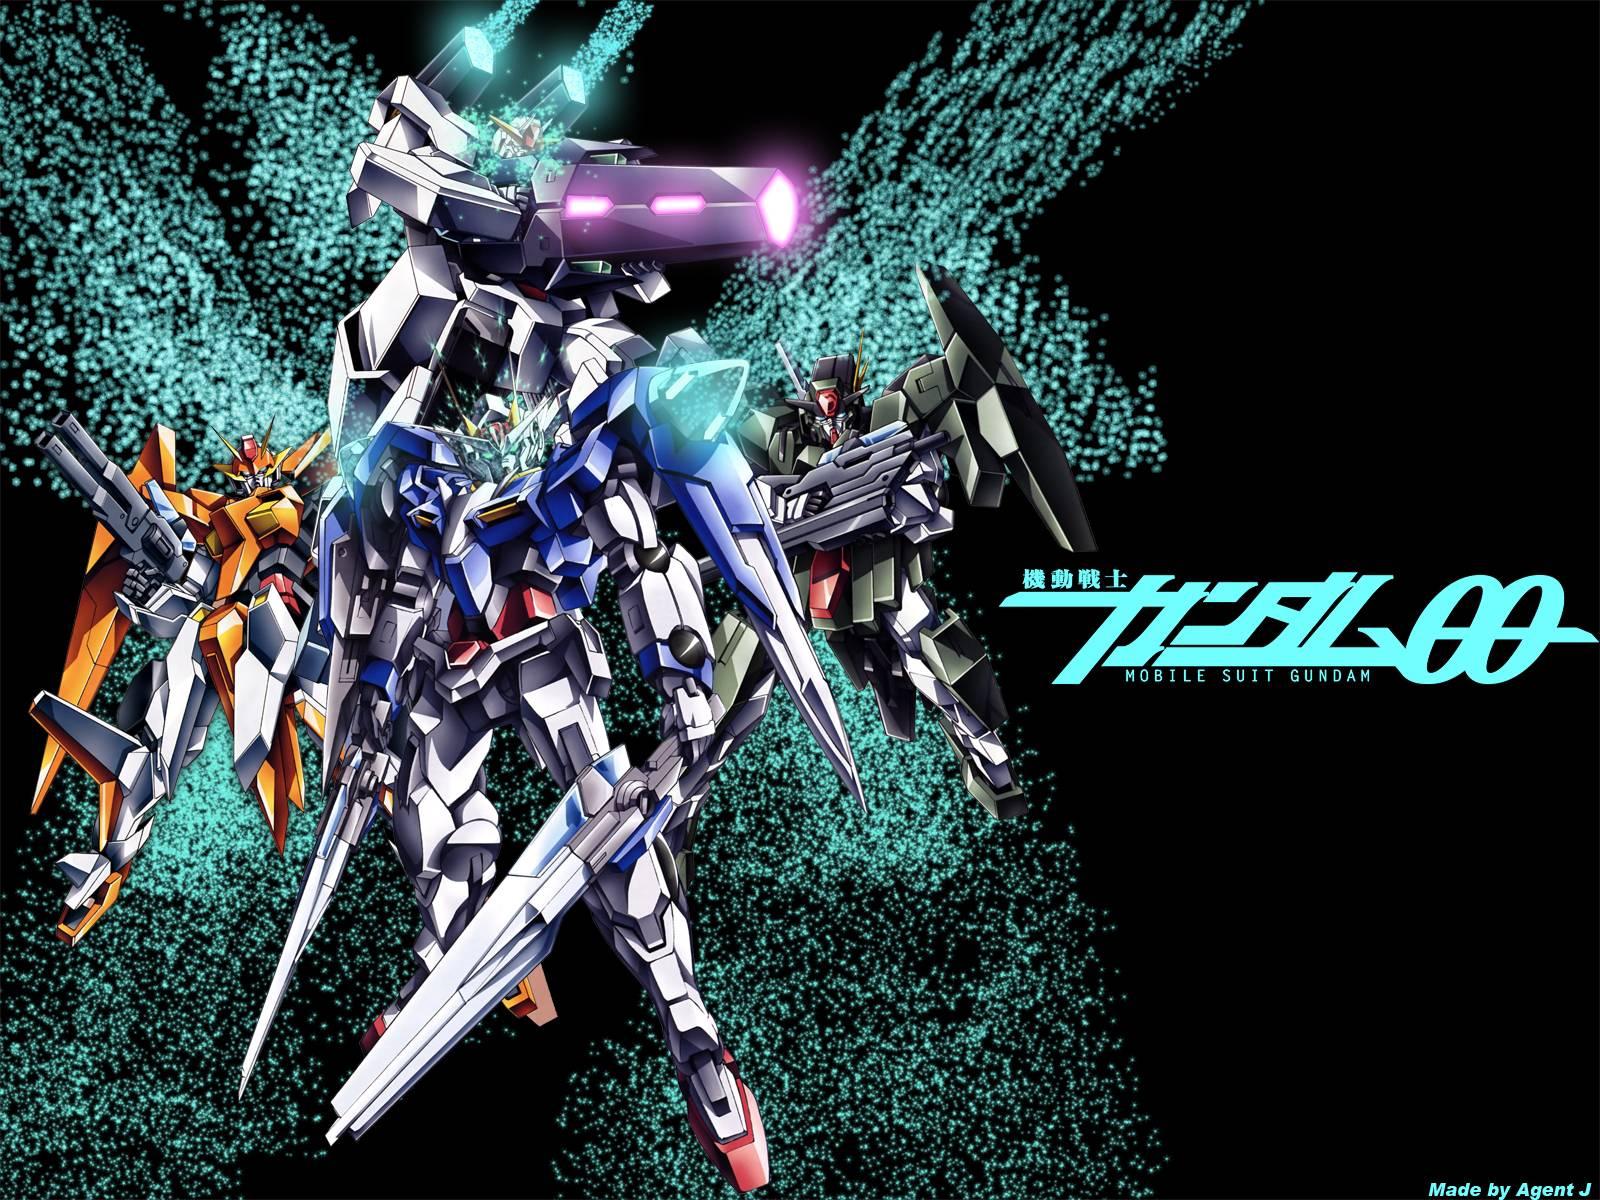 gundam double o season two   Gundam 00 Wallpaper 1600x1200